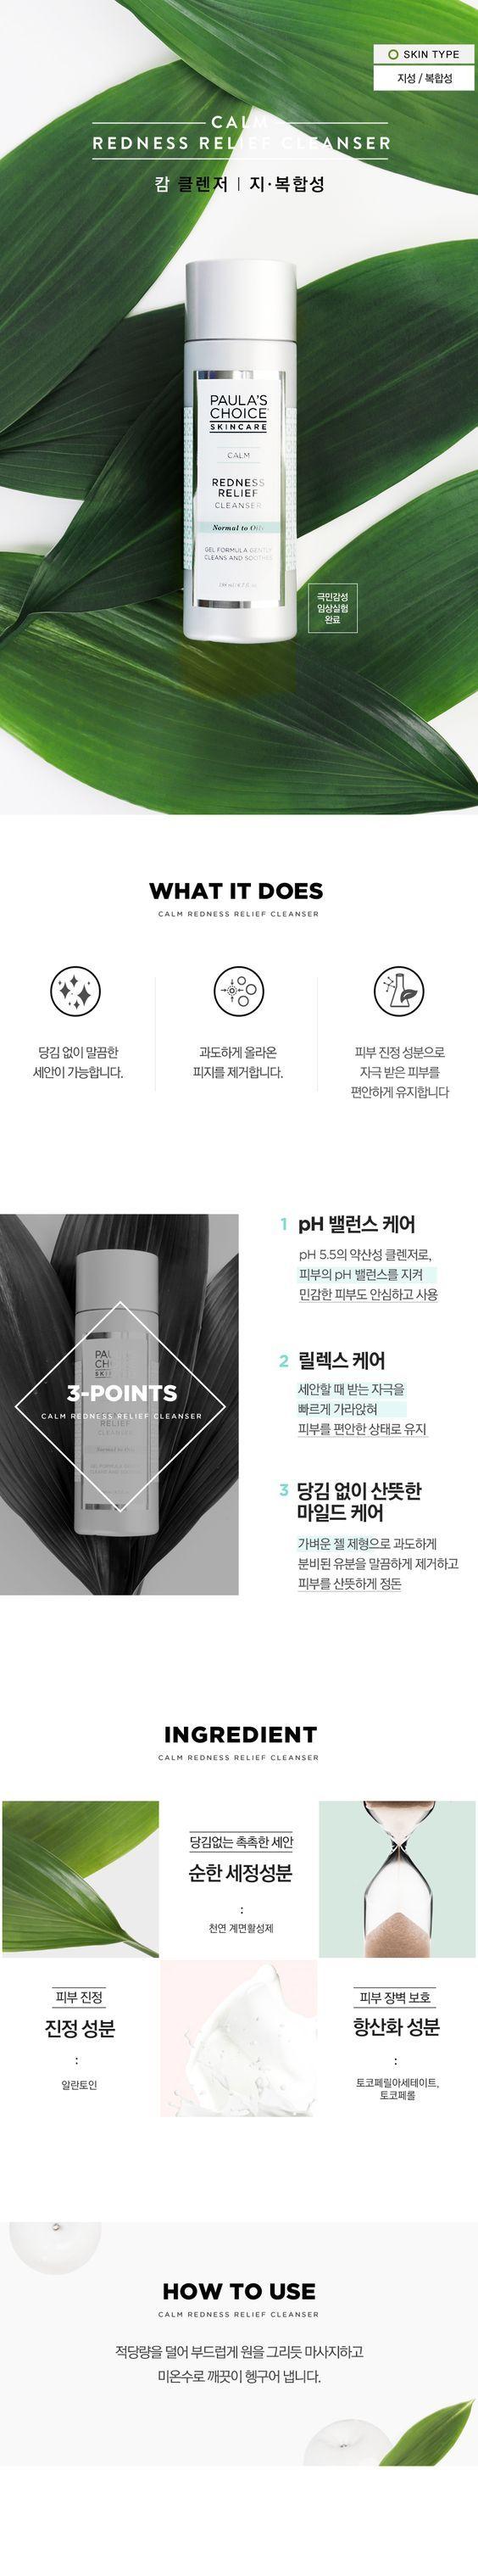 [paula'schoice] cosmetics / webpage / toner / web / promotion / event / webdesign / layout / 상세페이지 / 화장품 / 폴라초이스: